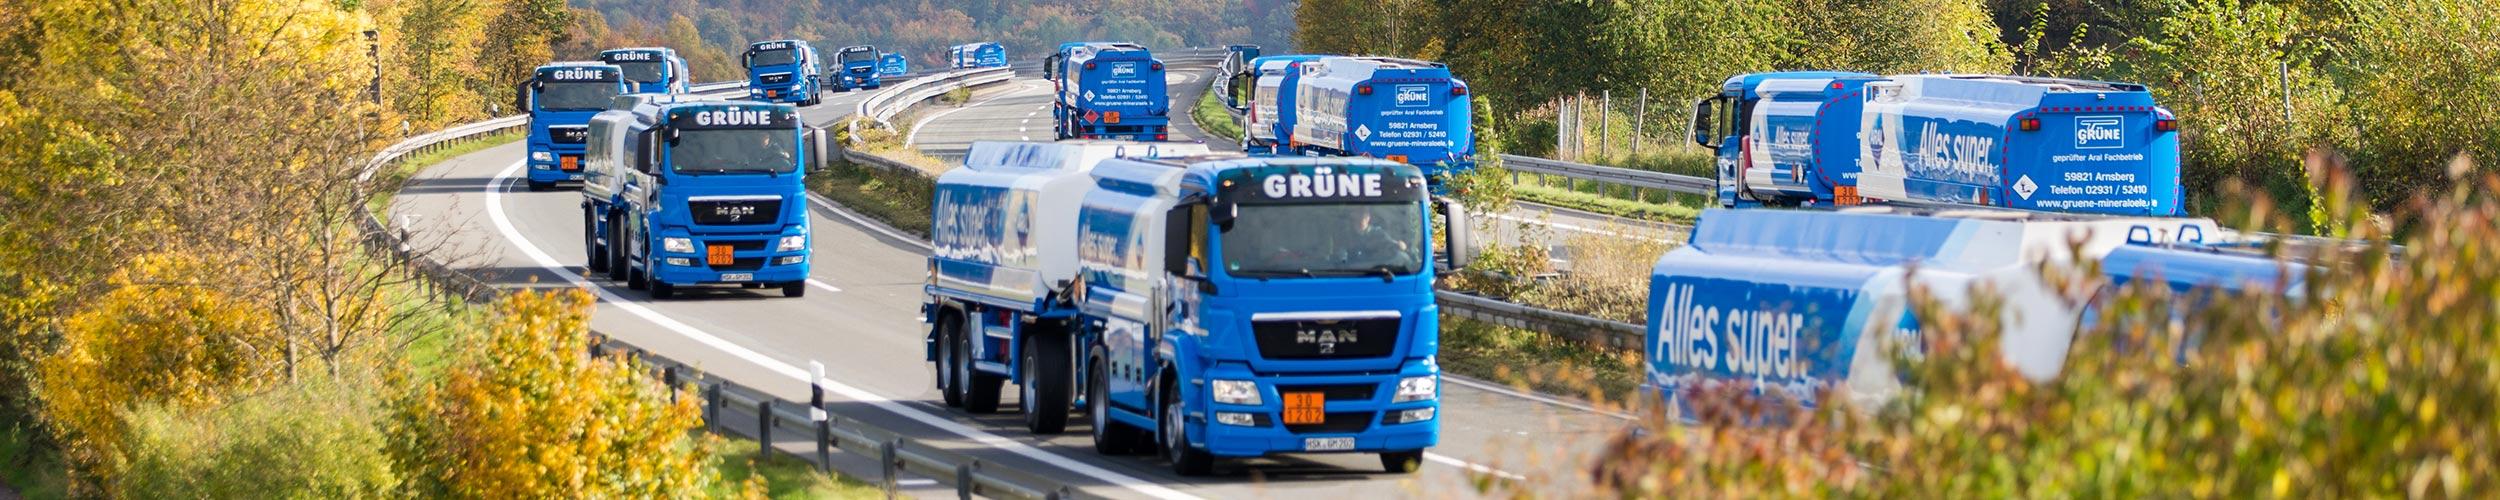 fuhrpark_gruene_mineraloele_003